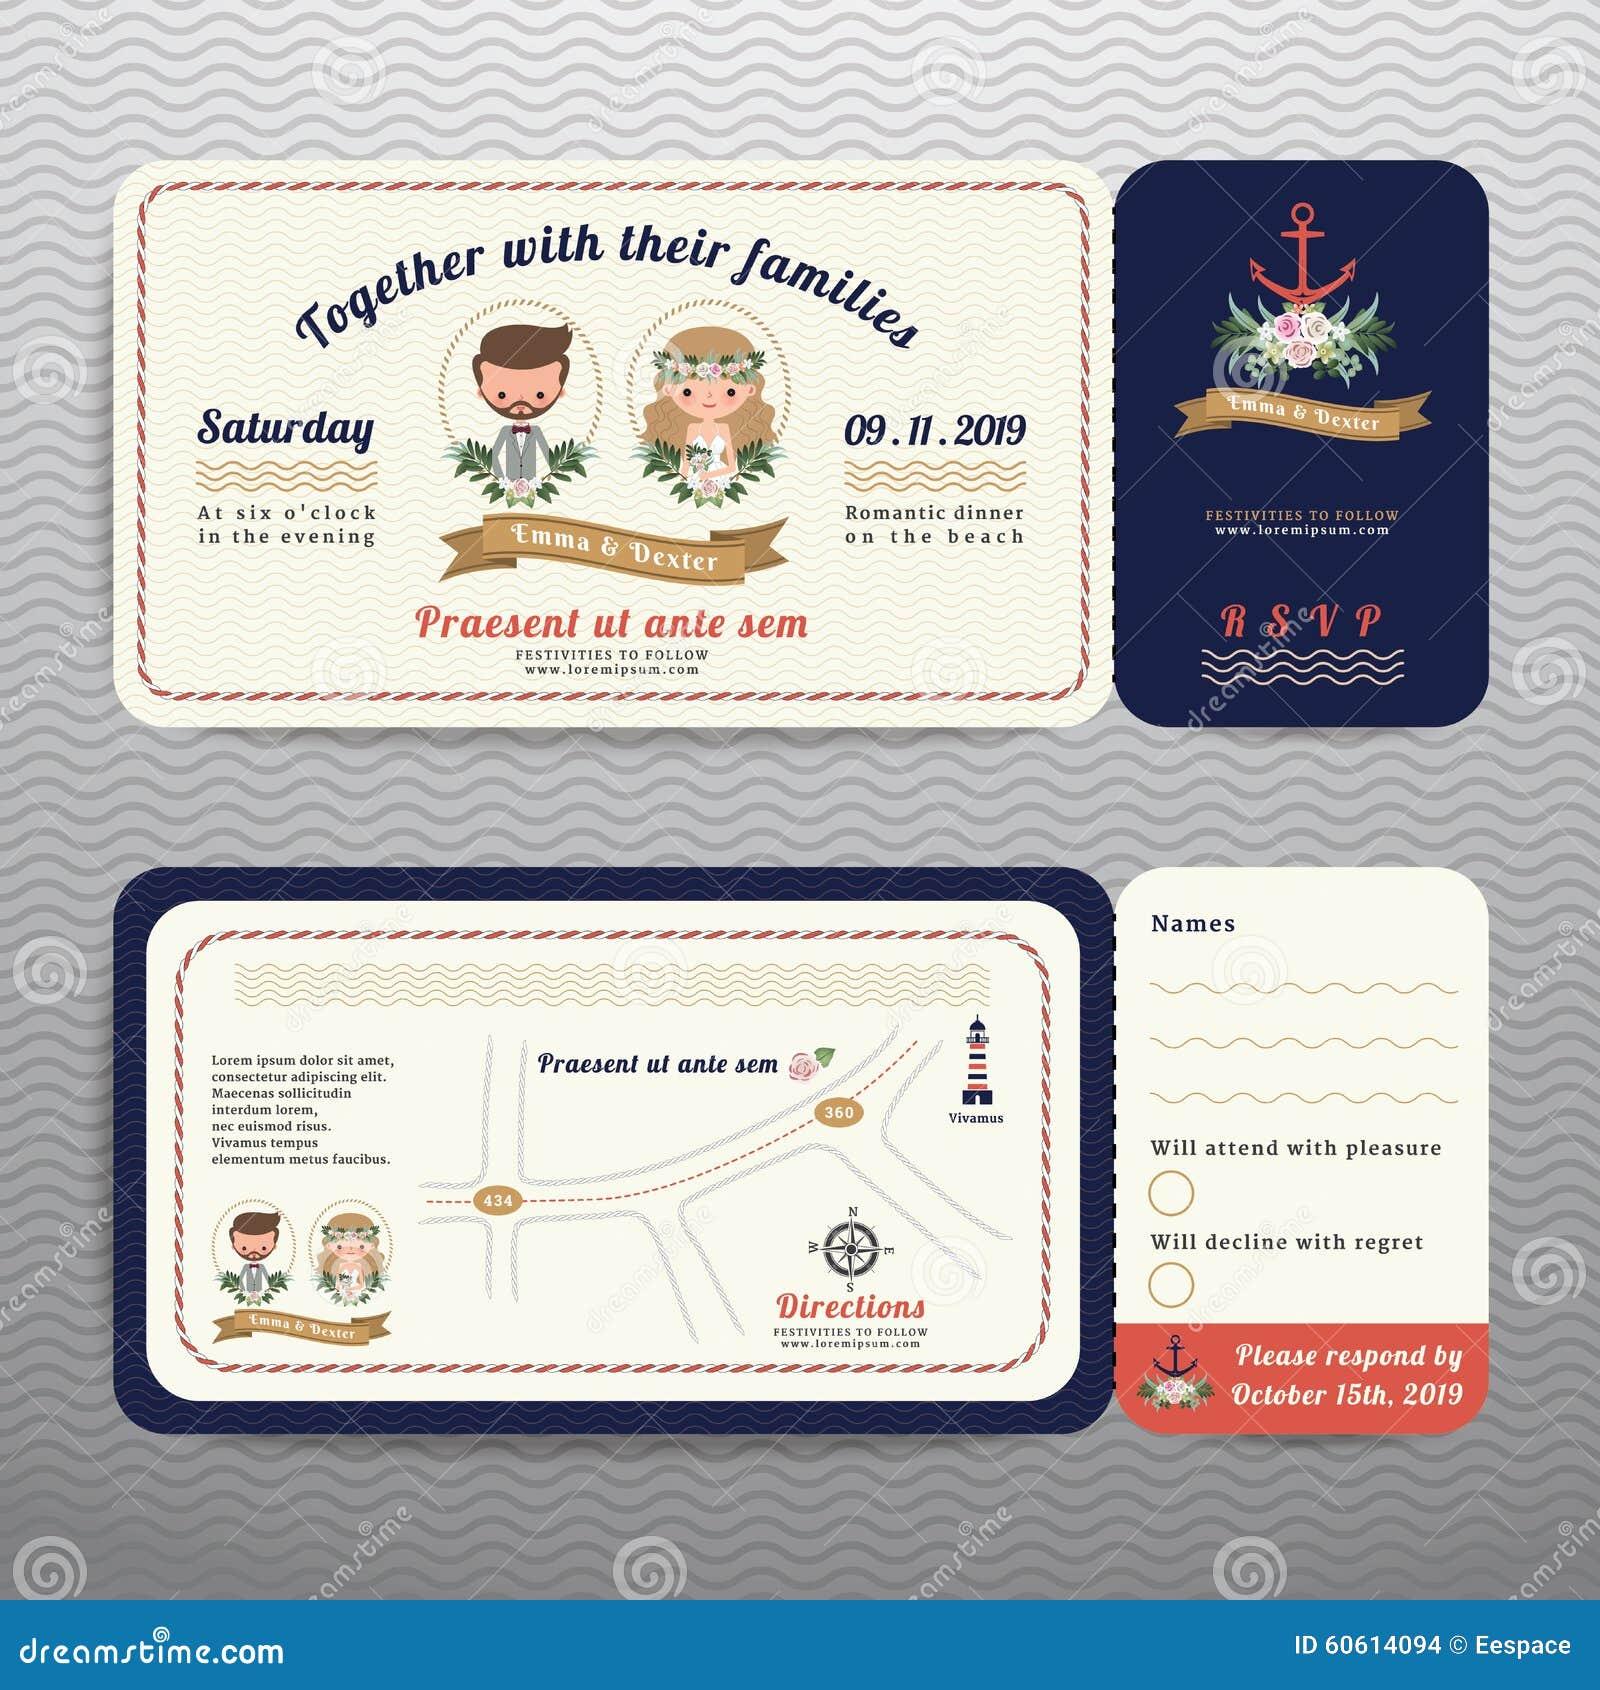 ticket wedding invitation - Yelom.myphonecompany.co